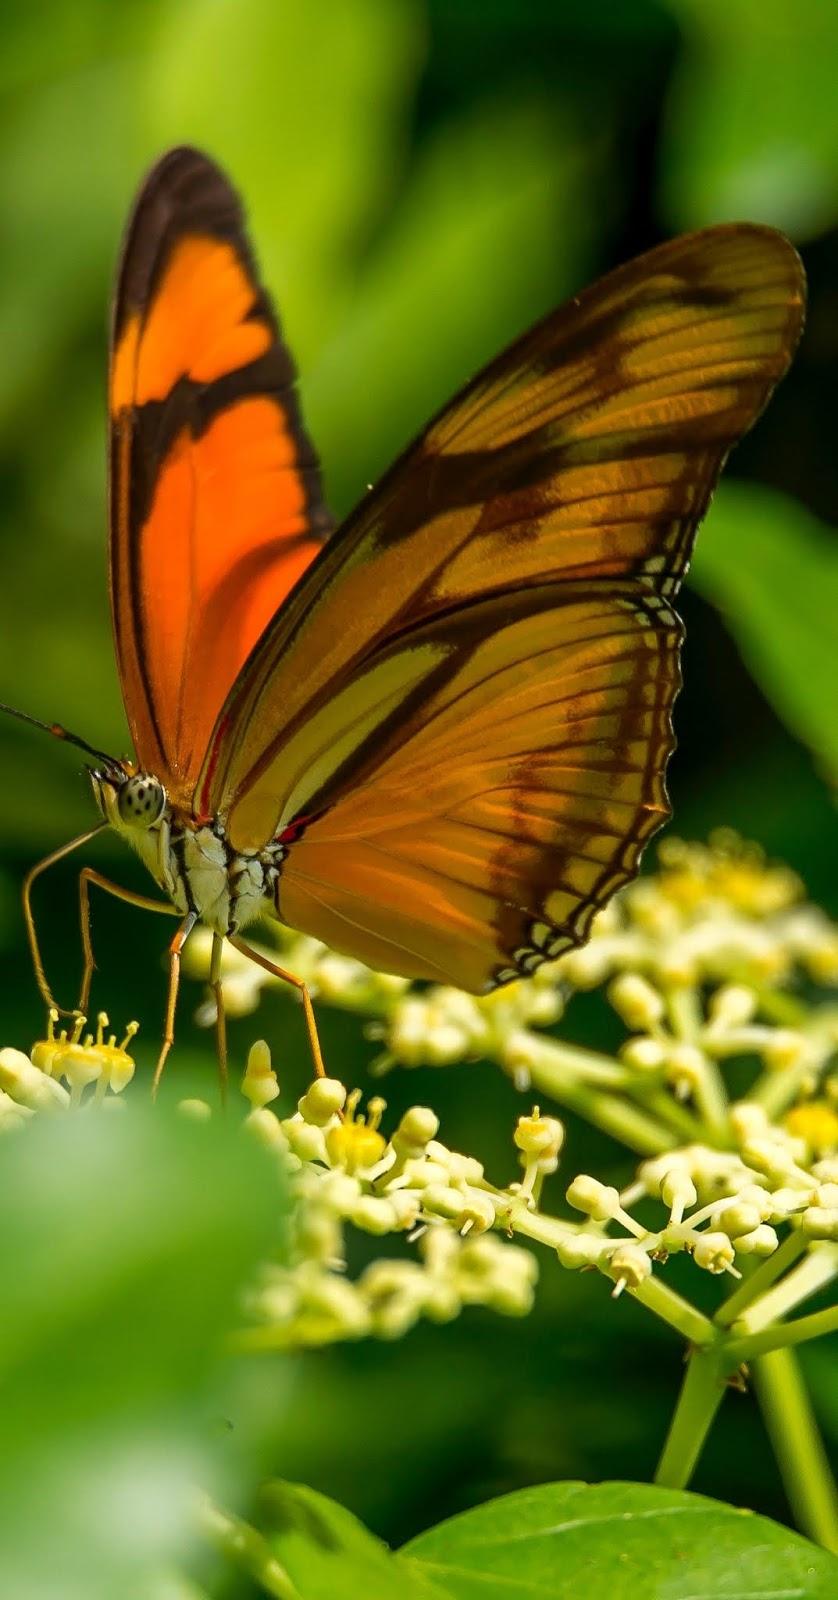 A butterfly sucking nectar.